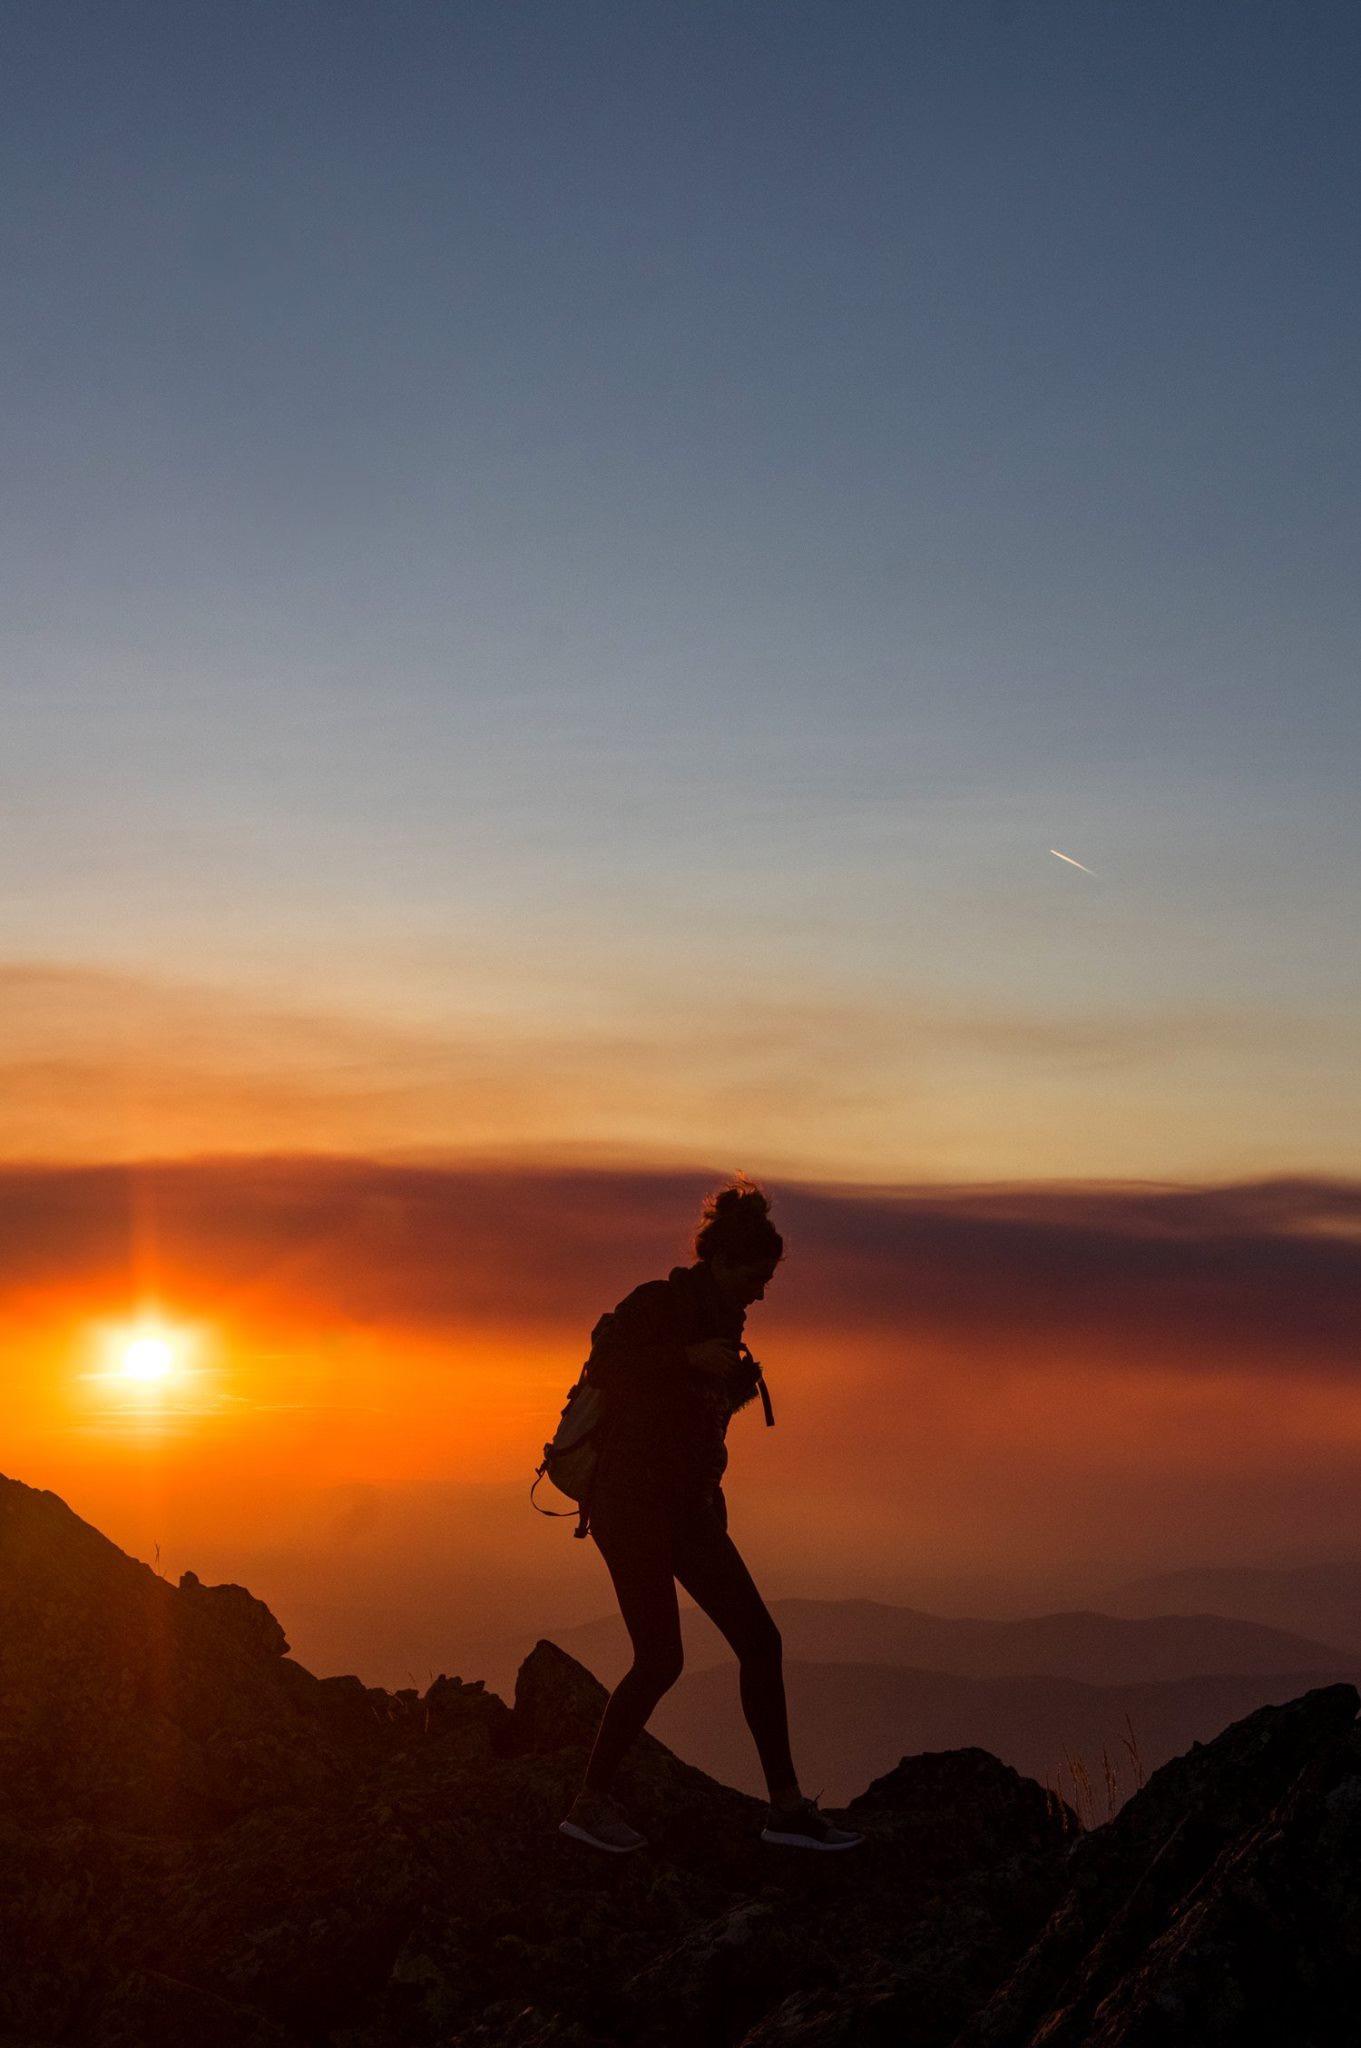 September sunset hike on Vitosha Mountain in Sofia, Bulgaria